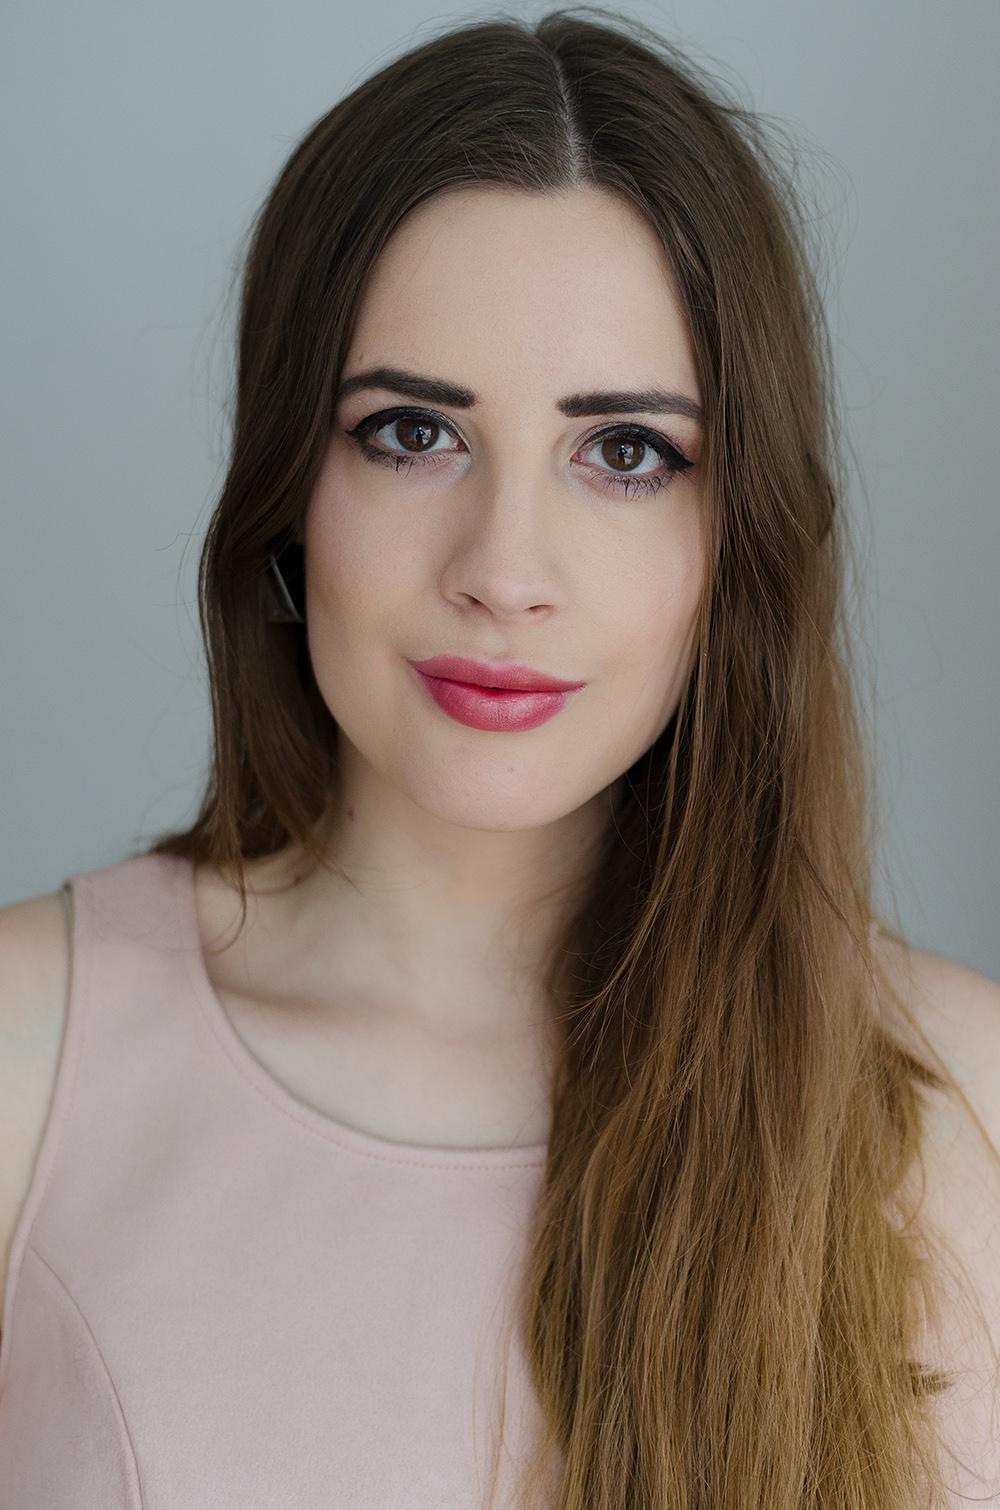 andysparkles-beautyblogger-beauty-influencer-lippenstift-tana-cosmetics-egypt-wonder